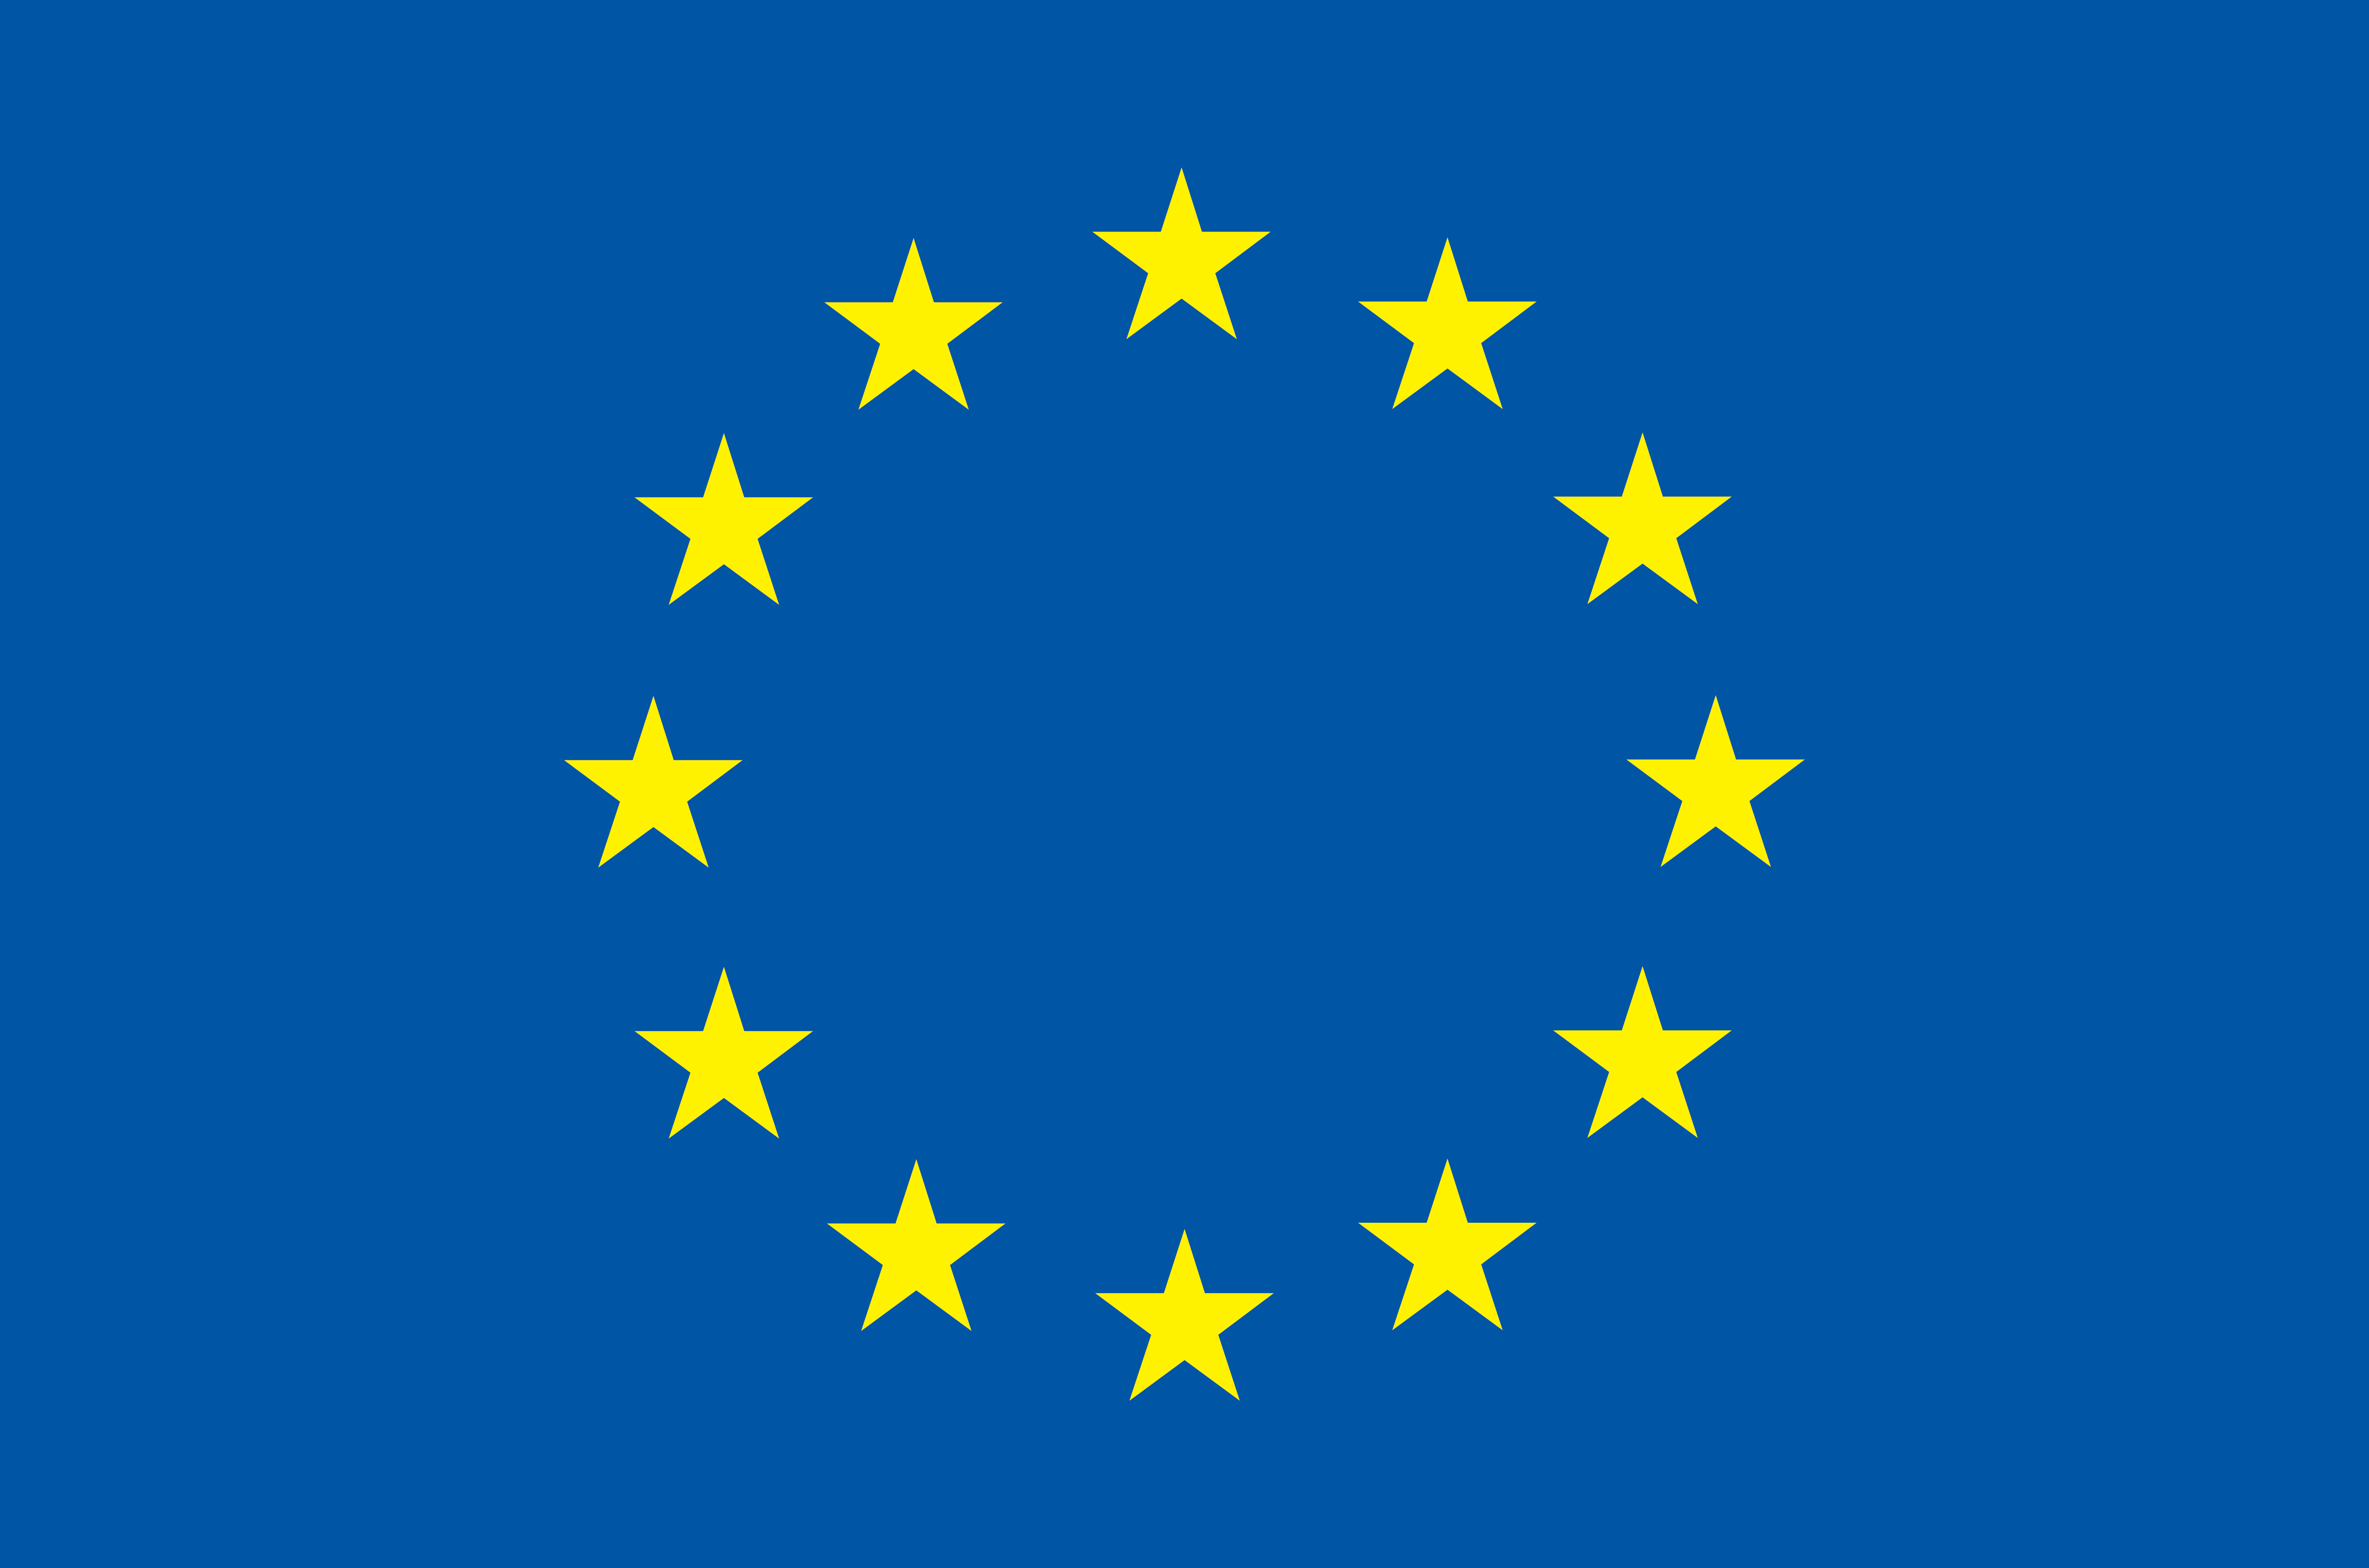 flag_yellow_high.jpg